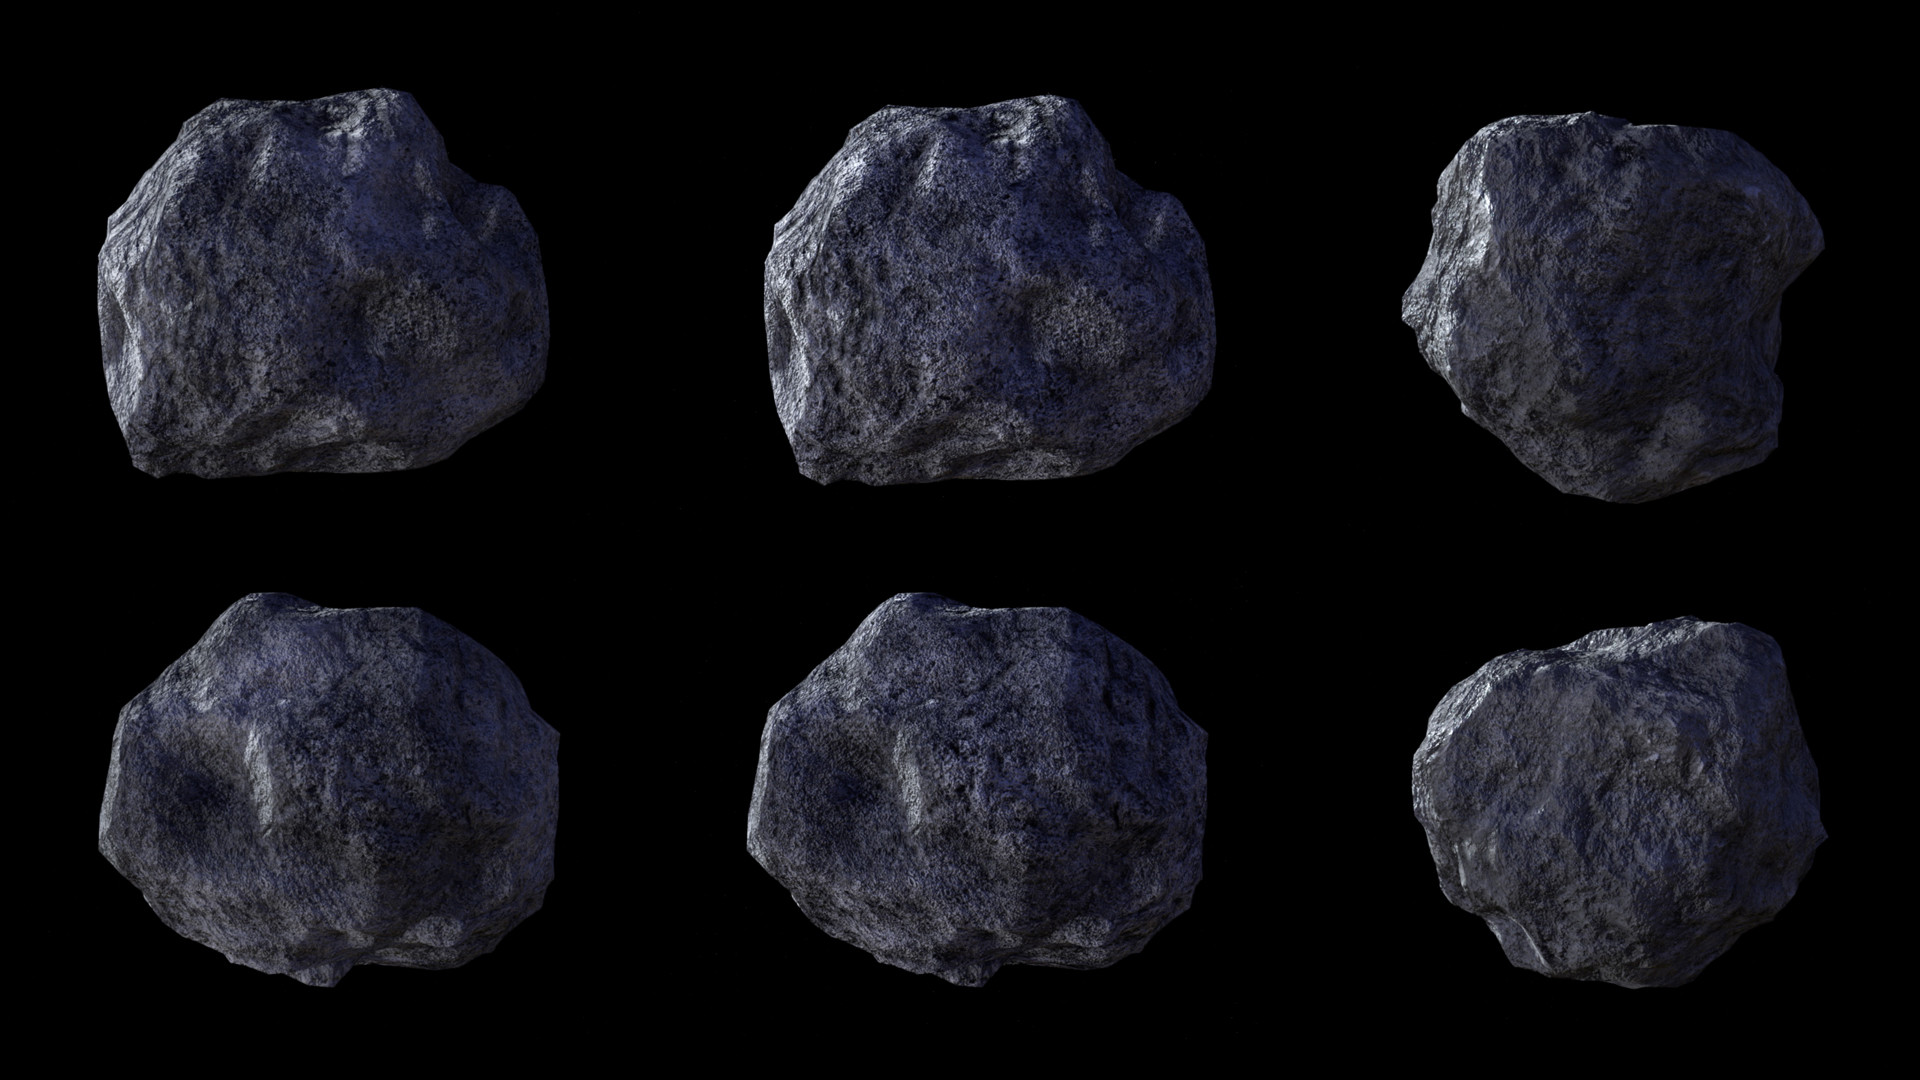 Robert kuroto asteroids 2